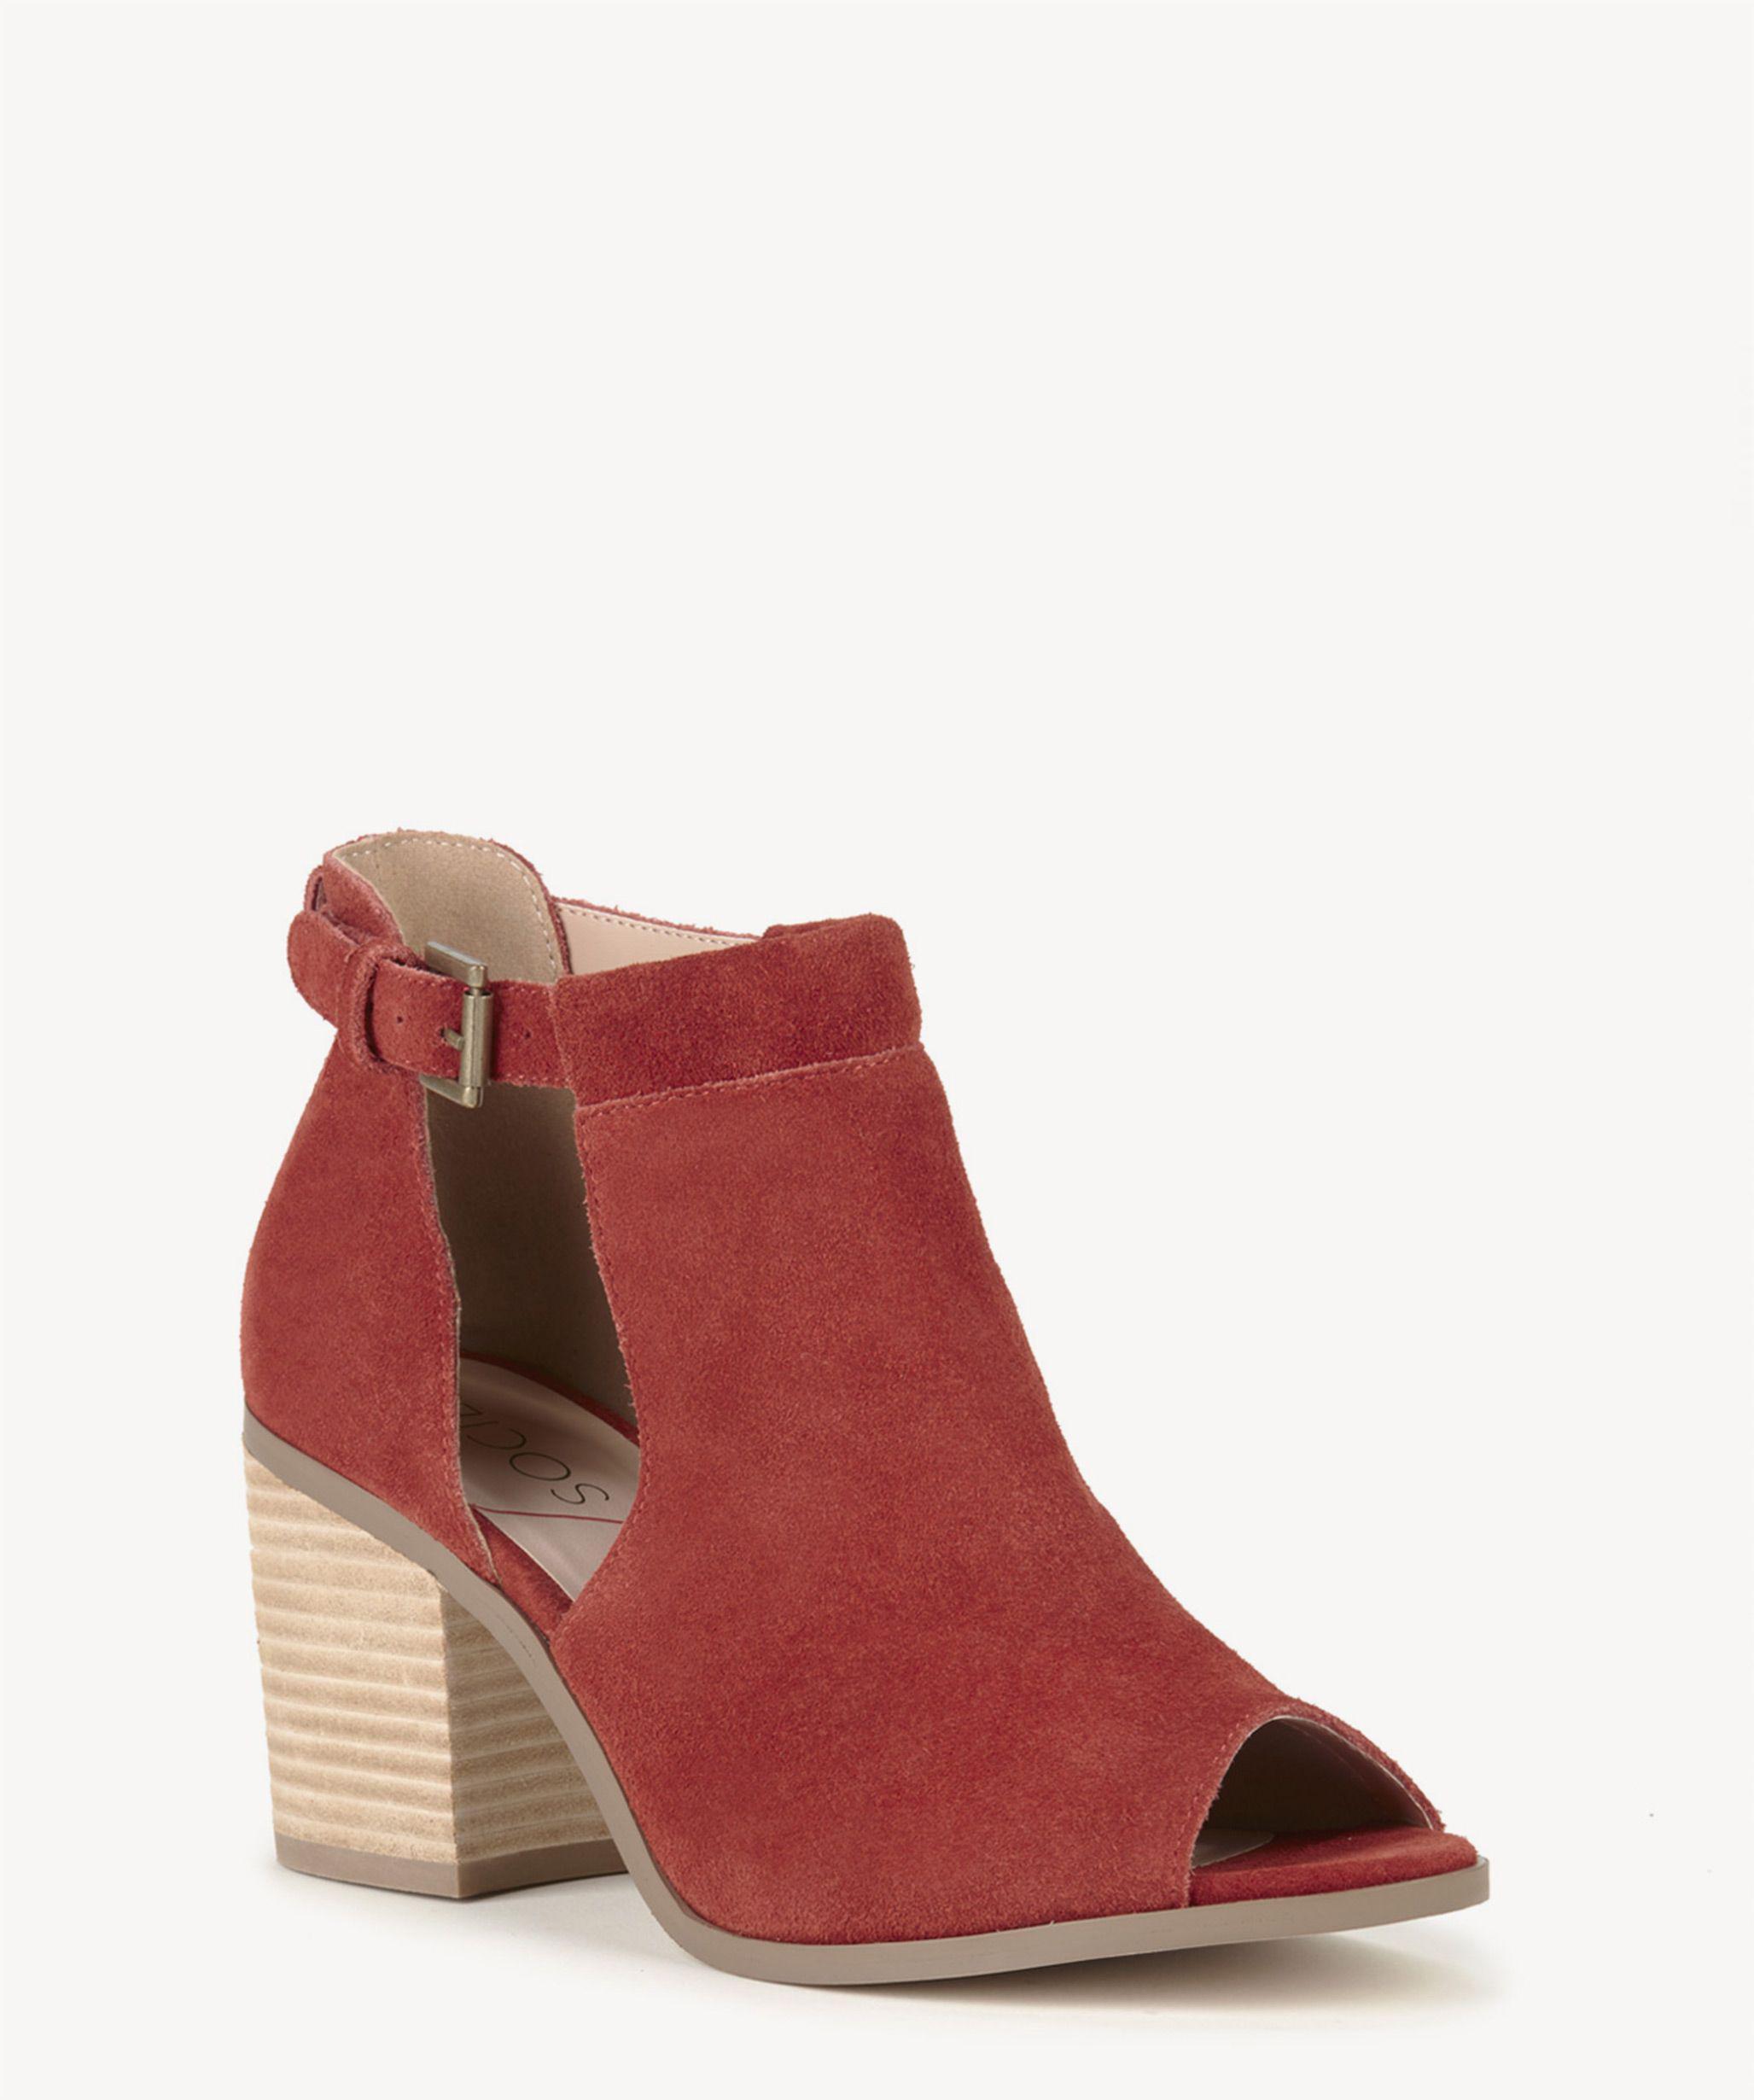 418729d82a3 Lyst - Sole Society Ferris Block Heel Sandal in Red